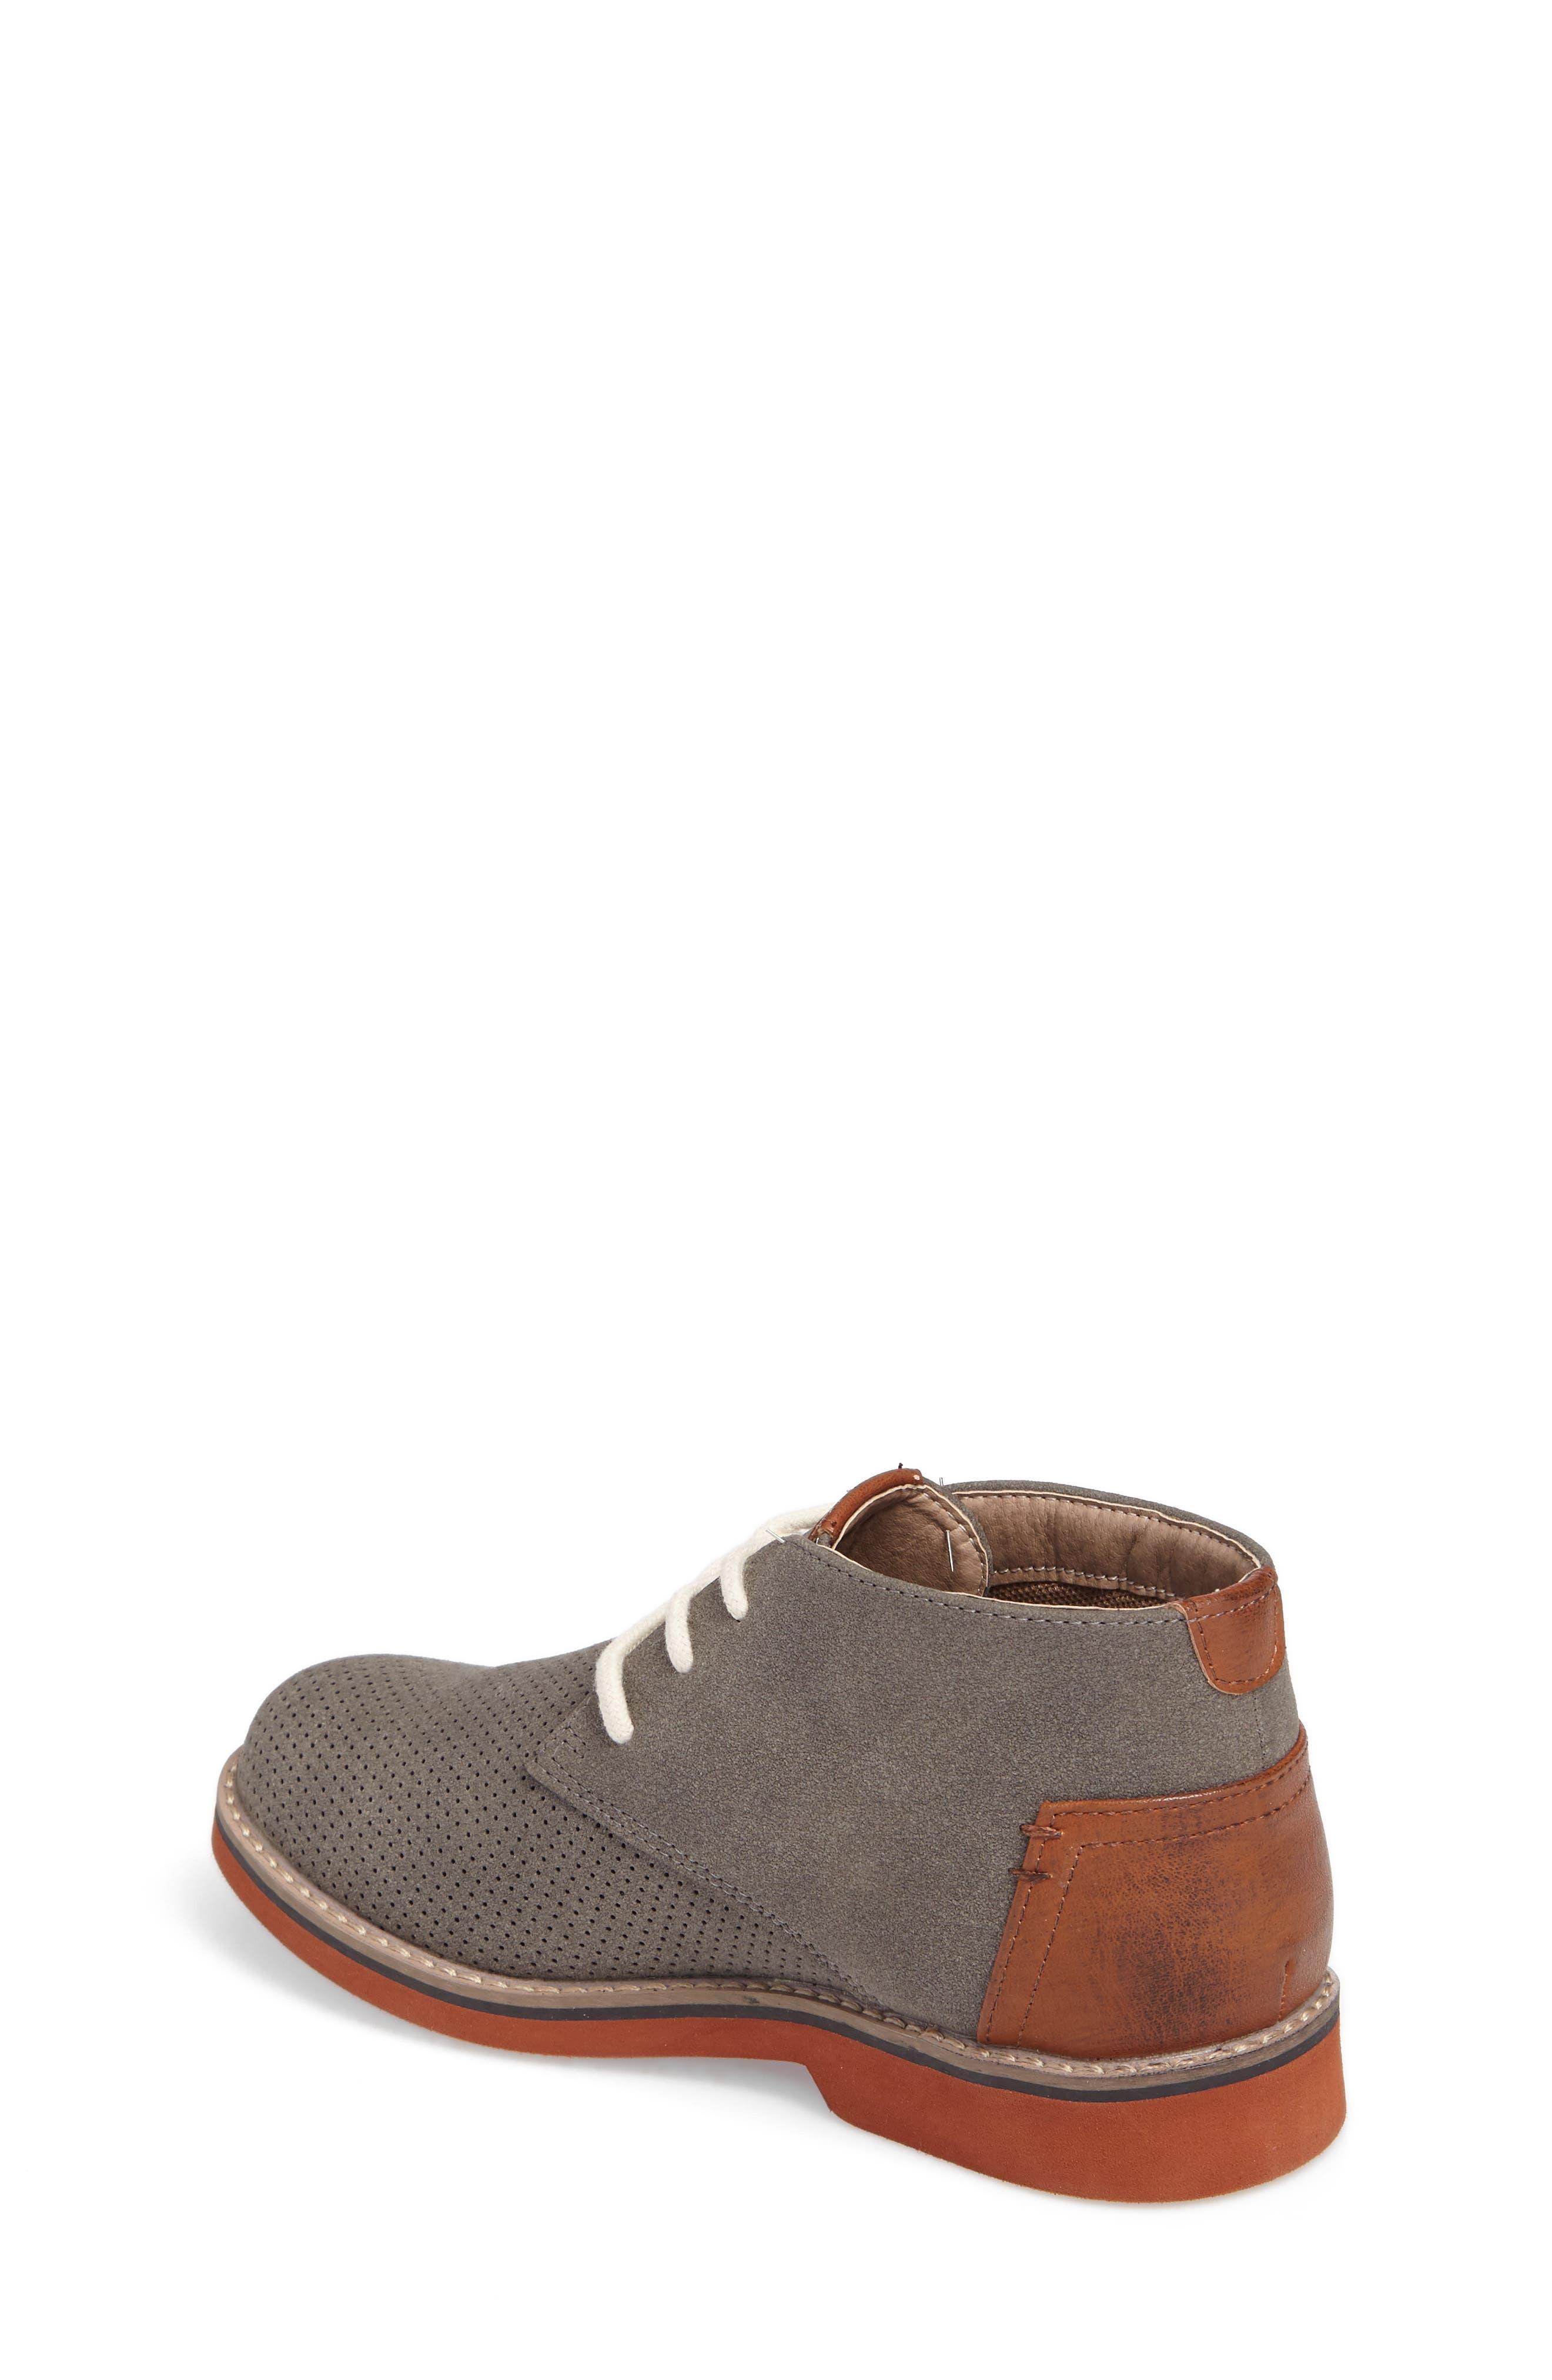 Baden Perforated Chukka Shoe,                             Alternate thumbnail 2, color,                             055